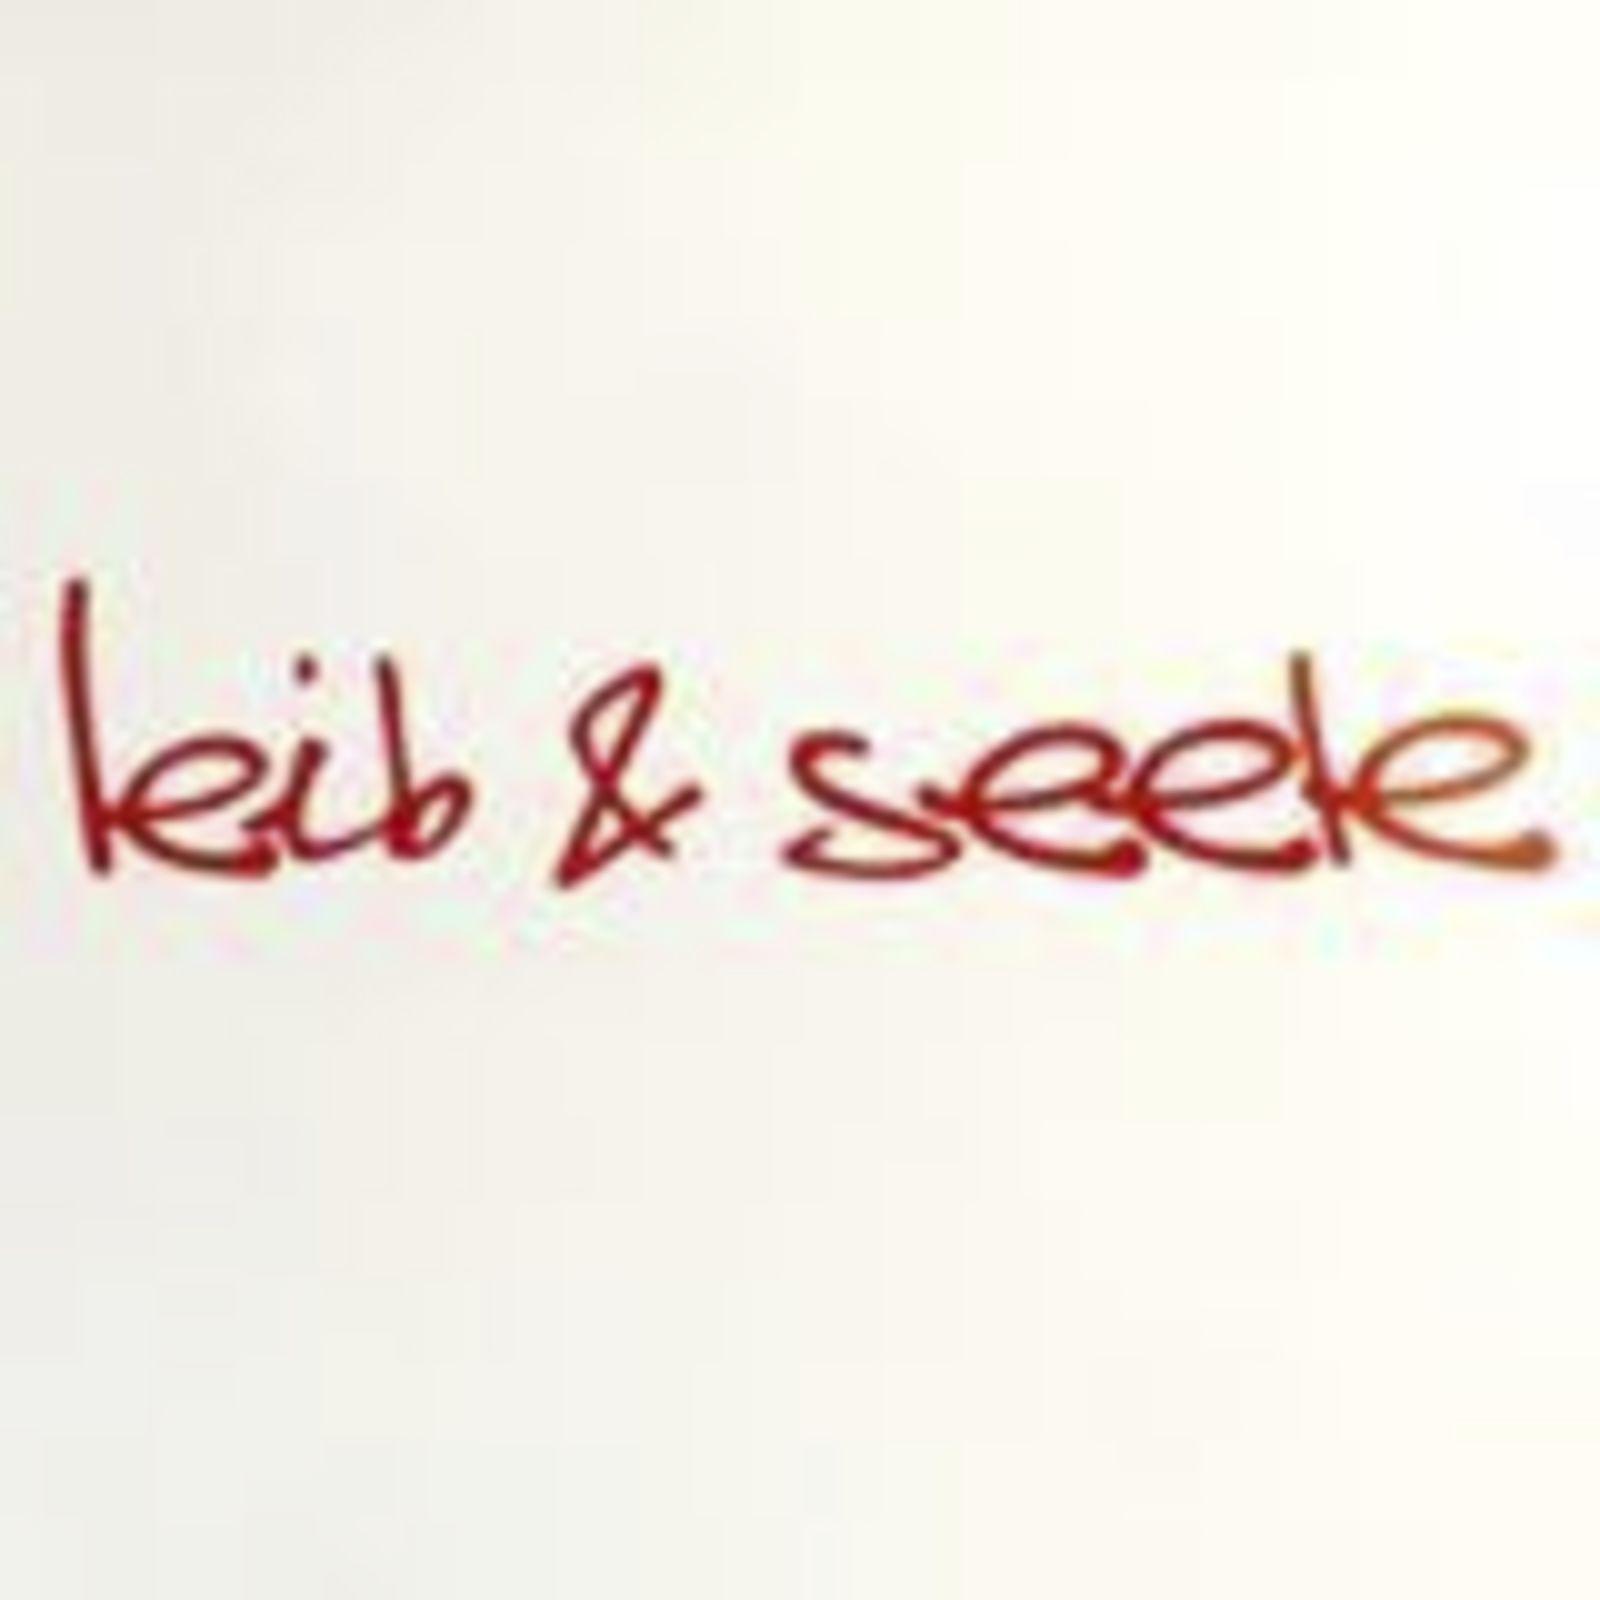 Leib & Seele in München (Bild 1)